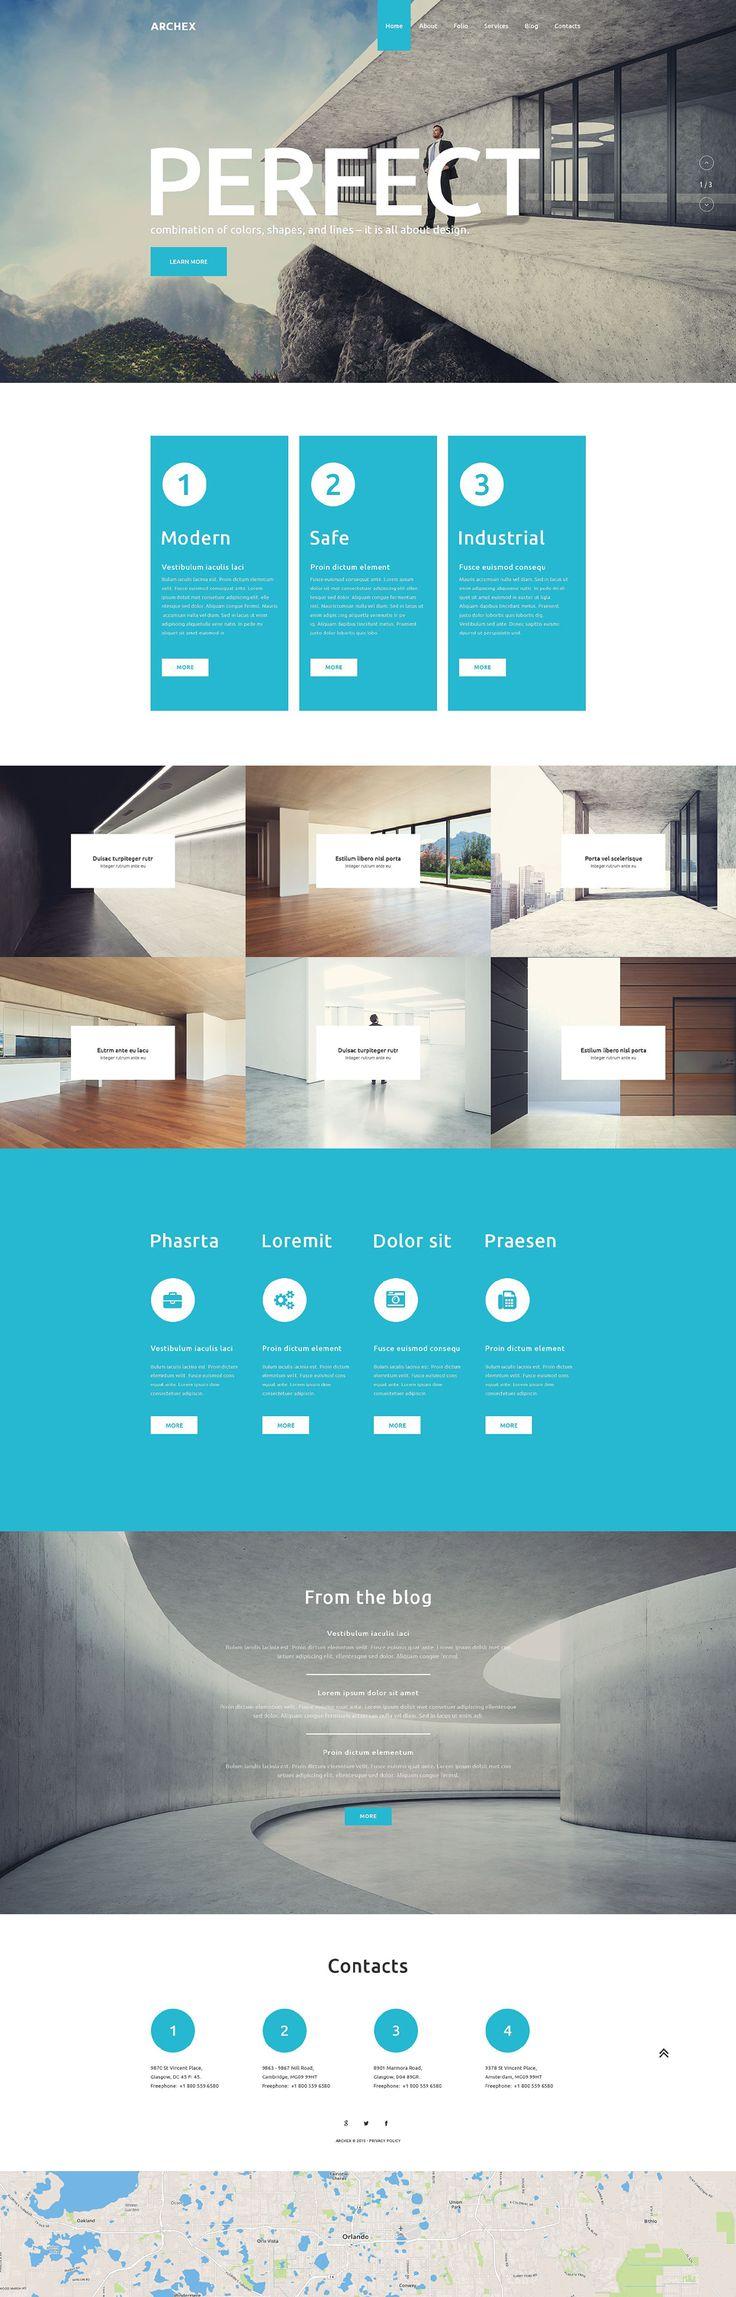 Architectural Finish WordPress Theme 578 best Templtes